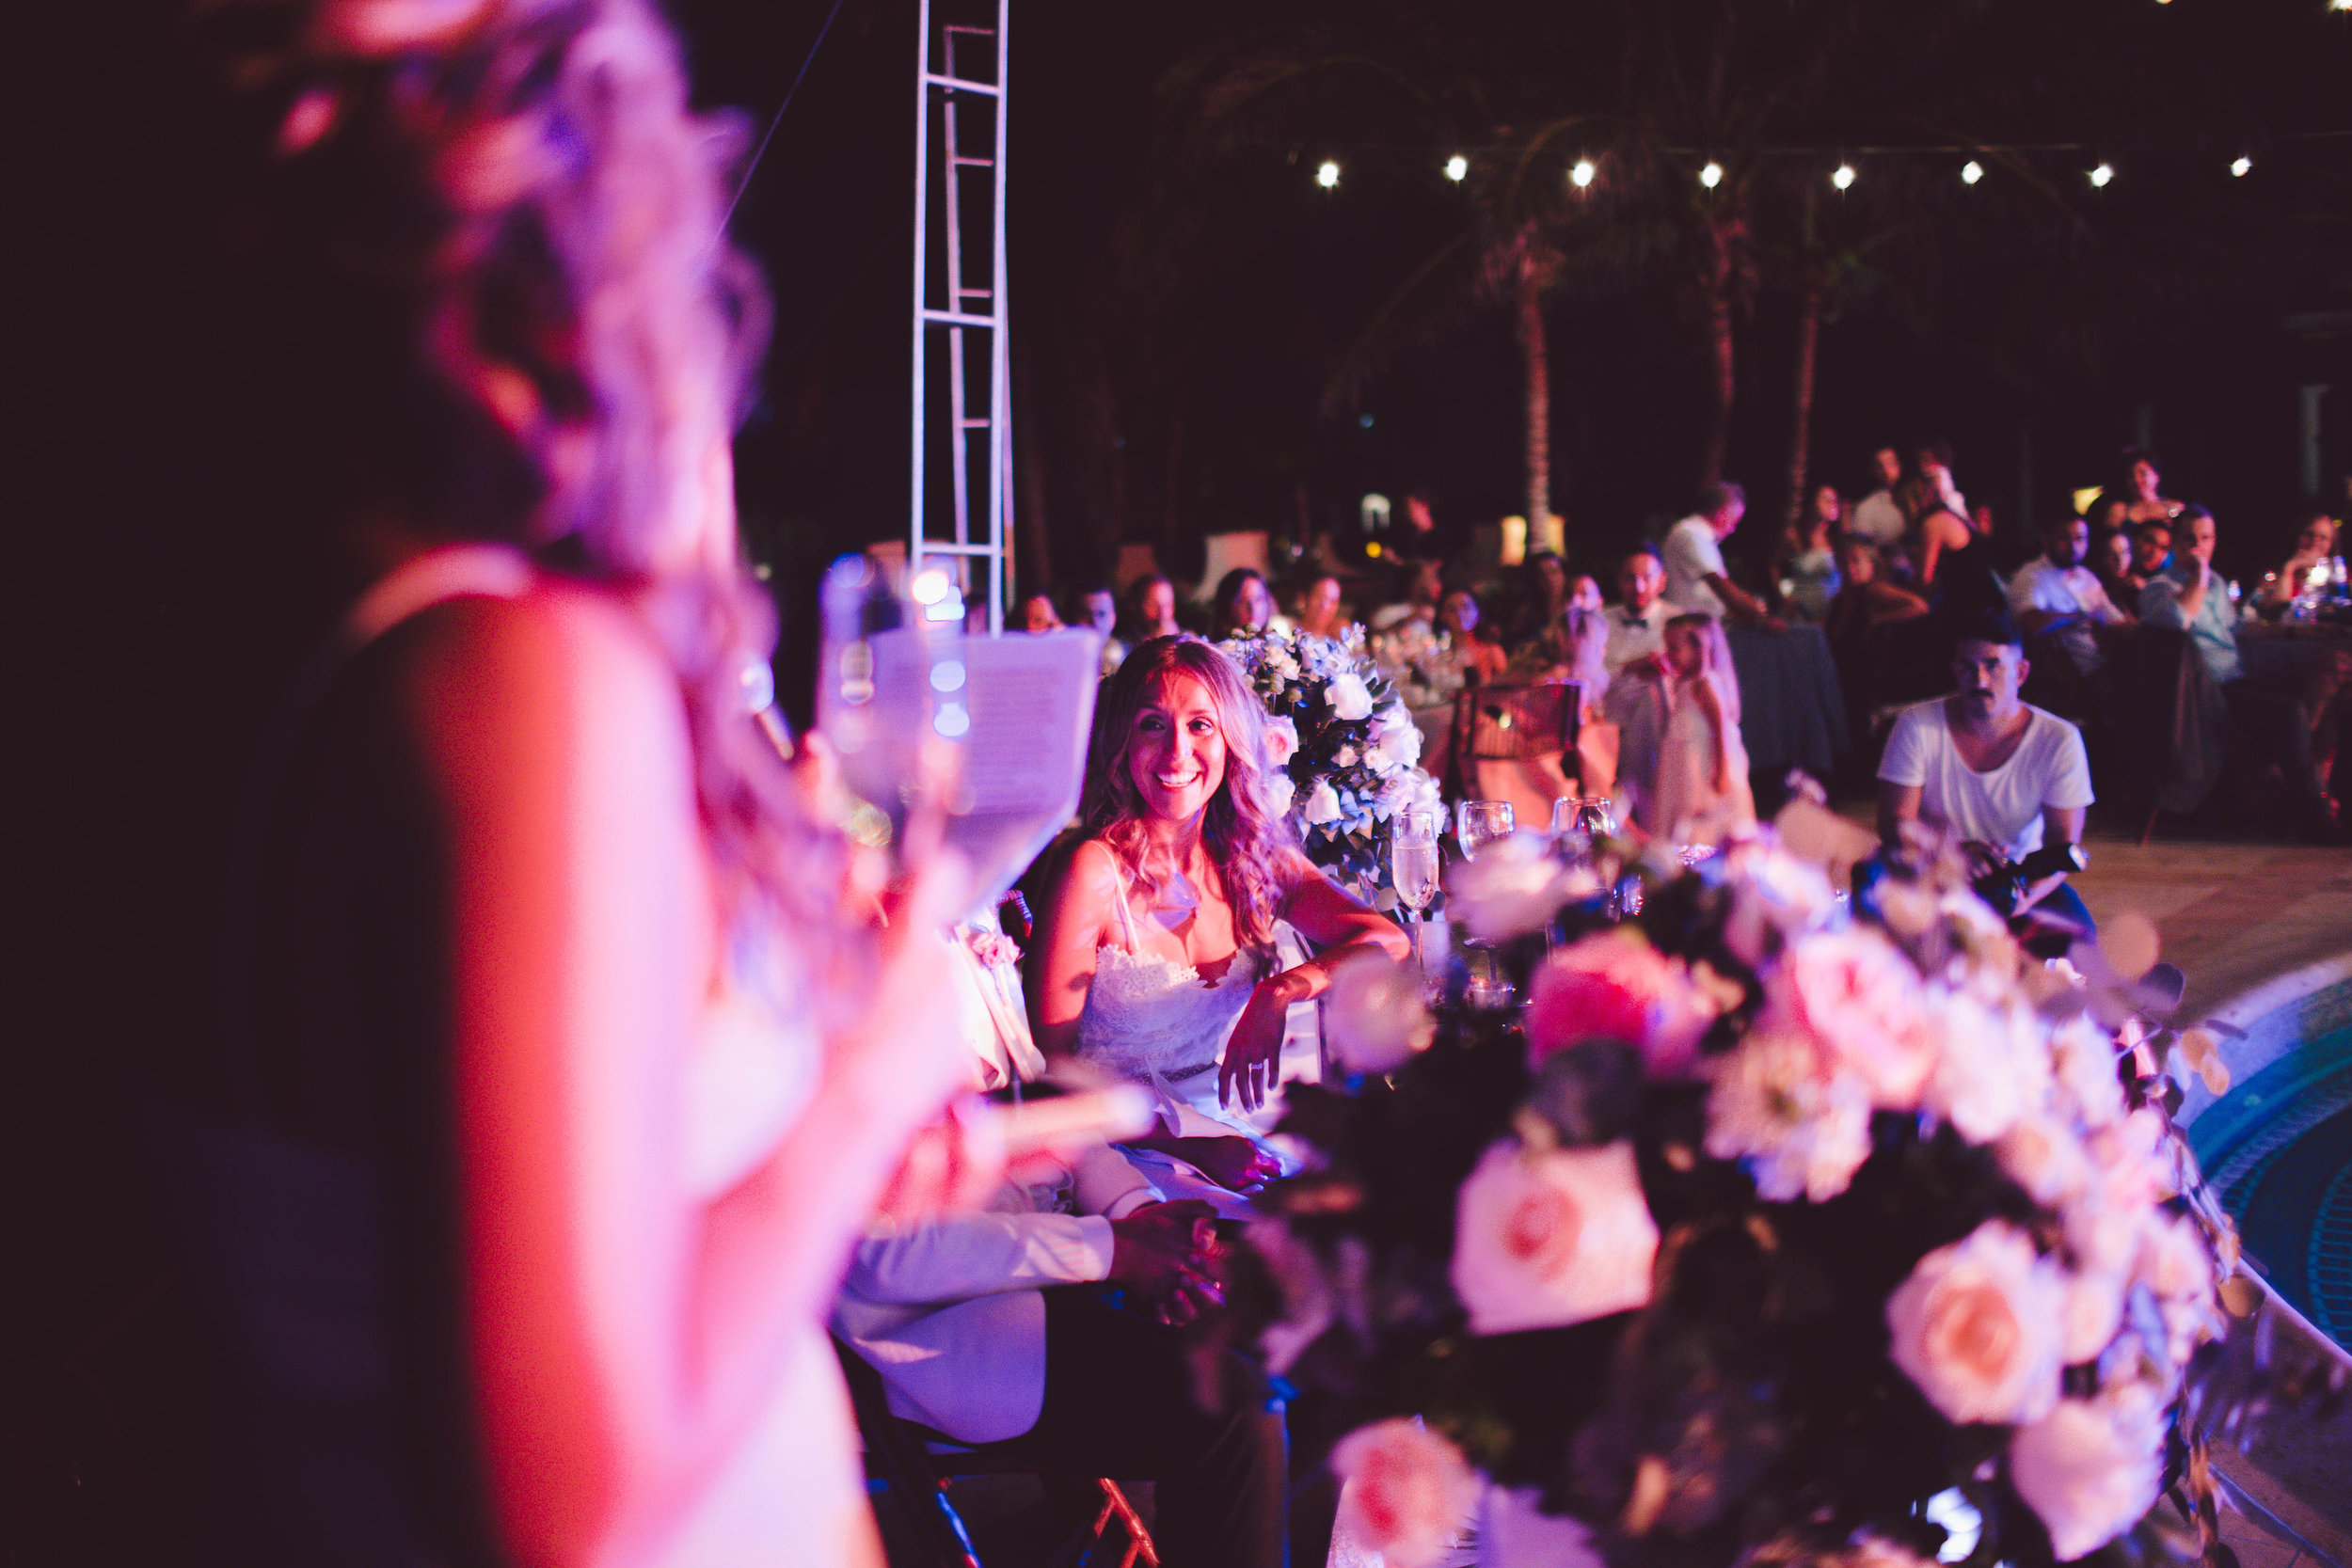 mexico_wedding_cancun_villa_la_joya_evangeline_lane_137.jpg